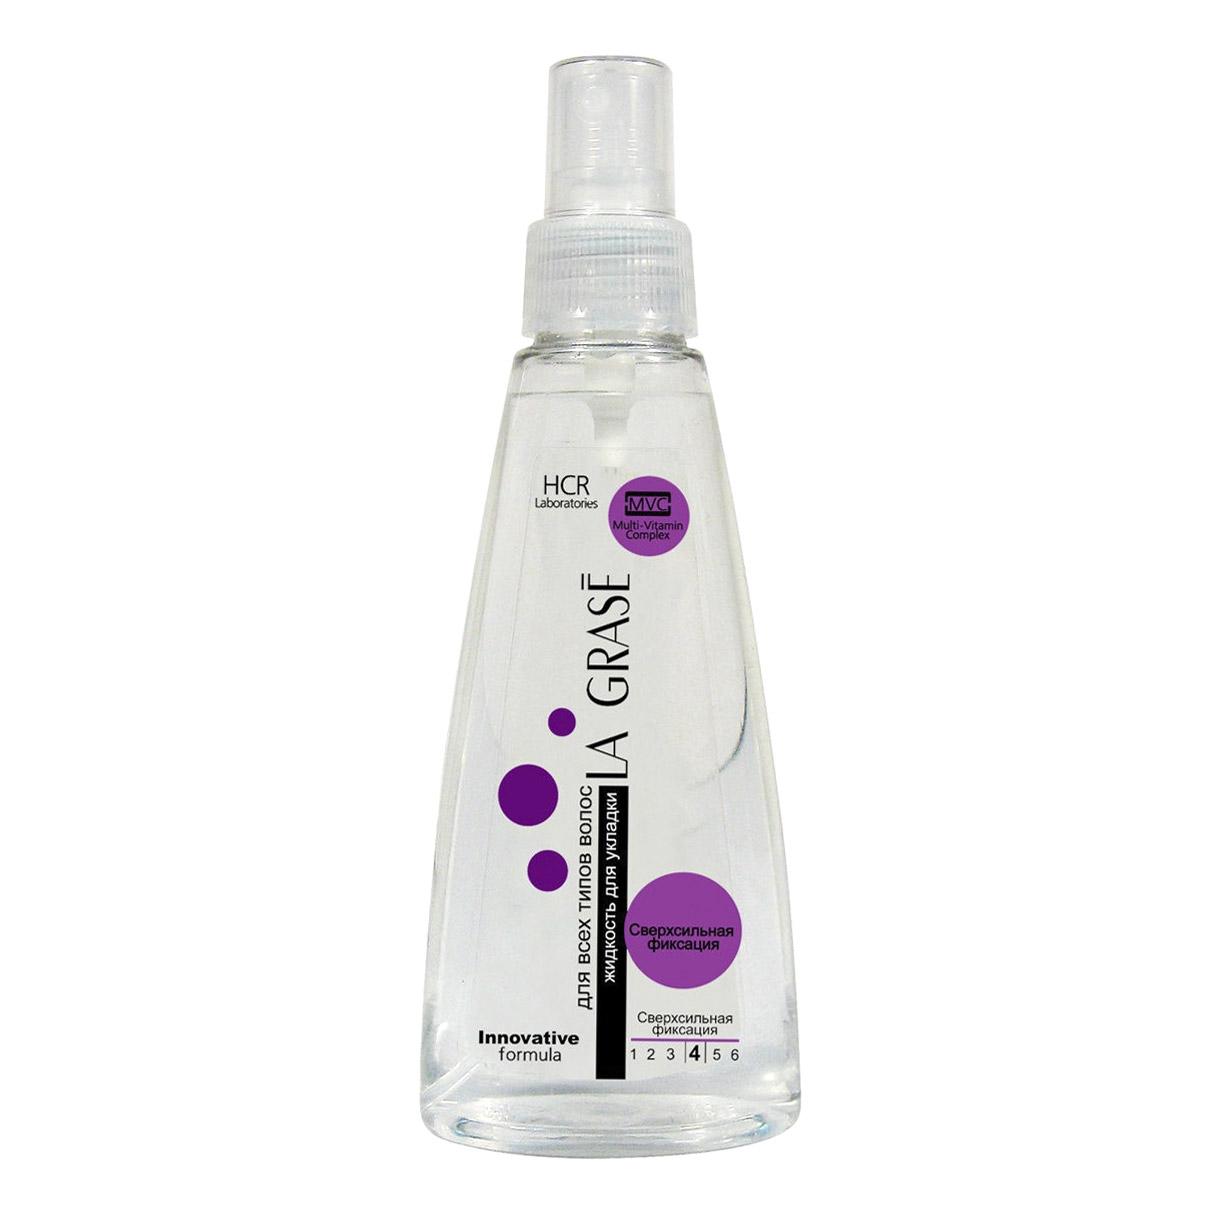 La grase Жидкость для укладки волос сверхсильн la grase 6564 фото